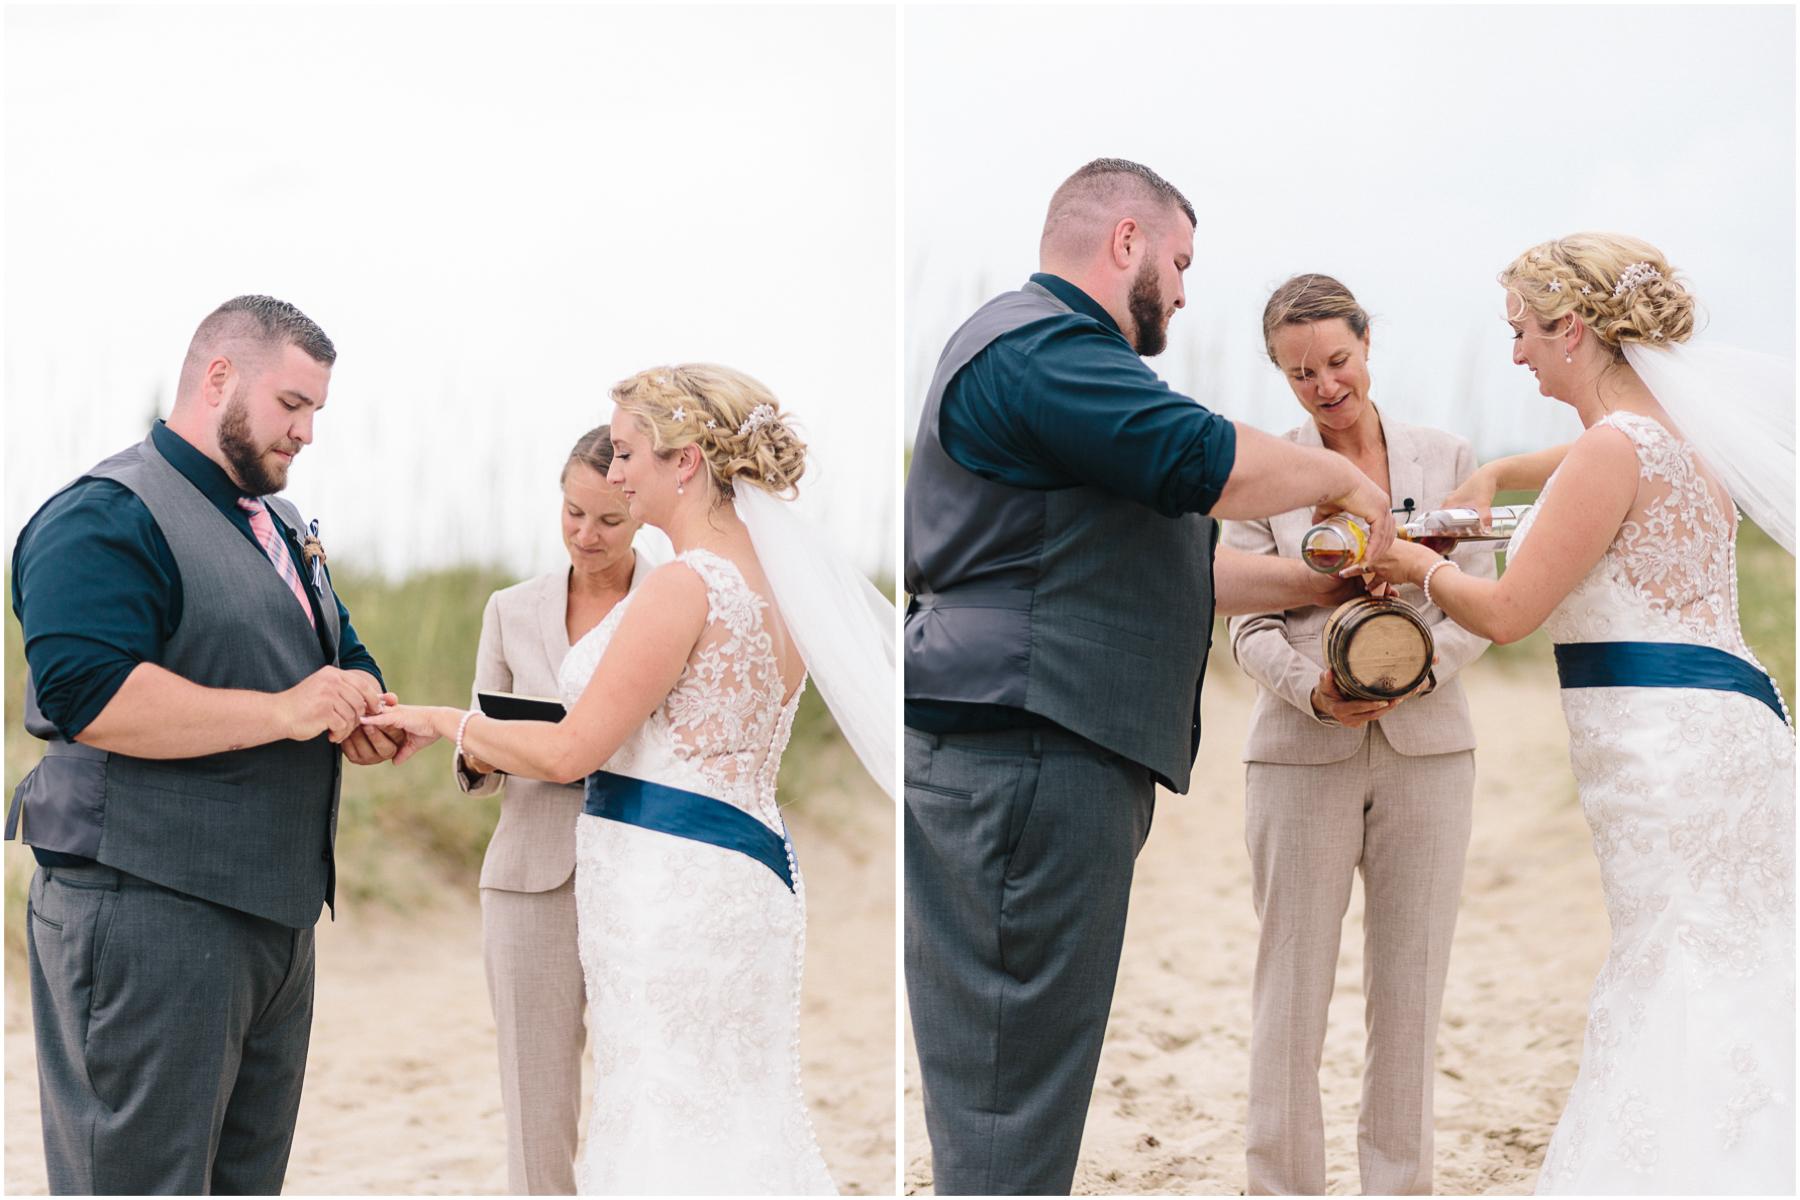 alyssa barletter photography buxton north carolina outer banks obx cape hatteras elopement intmate beach wedding-24.jpg